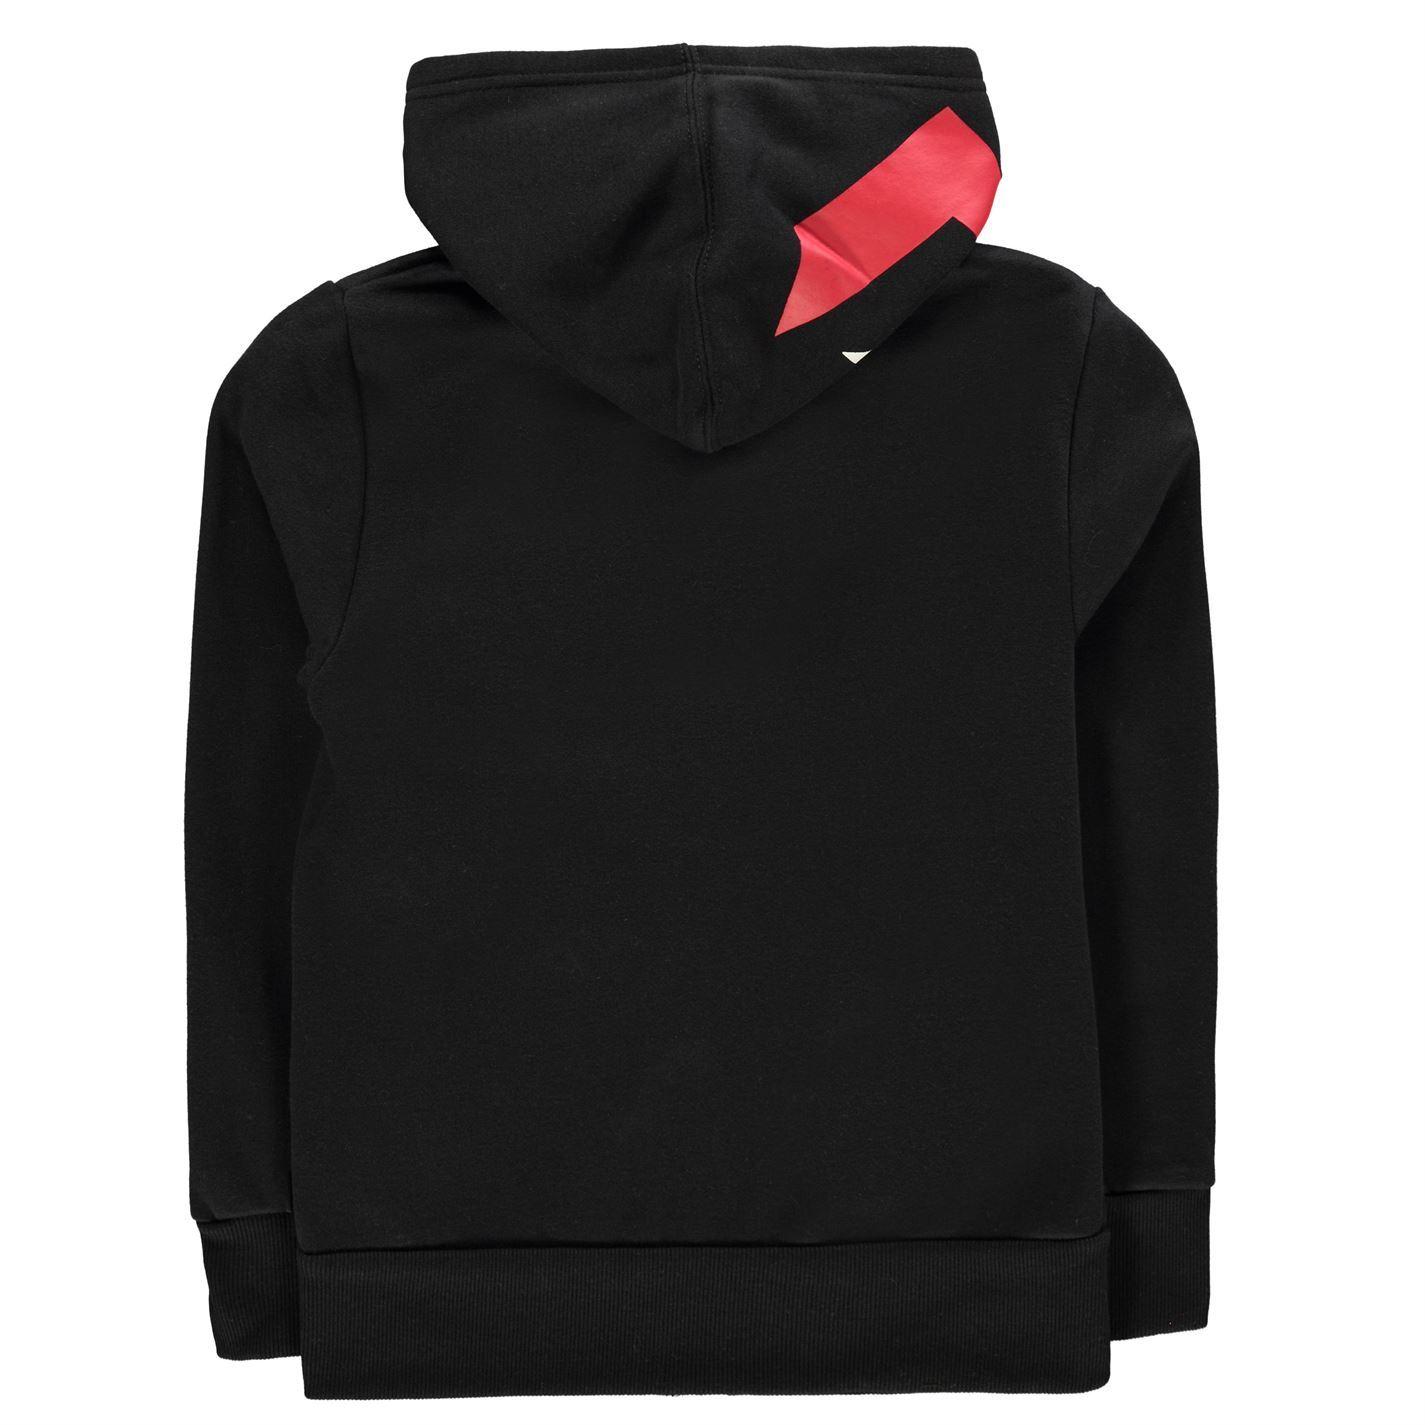 BAKER Kader Sylla Baker 4 Skate Video Black Hooded Sweatshirt Supreme